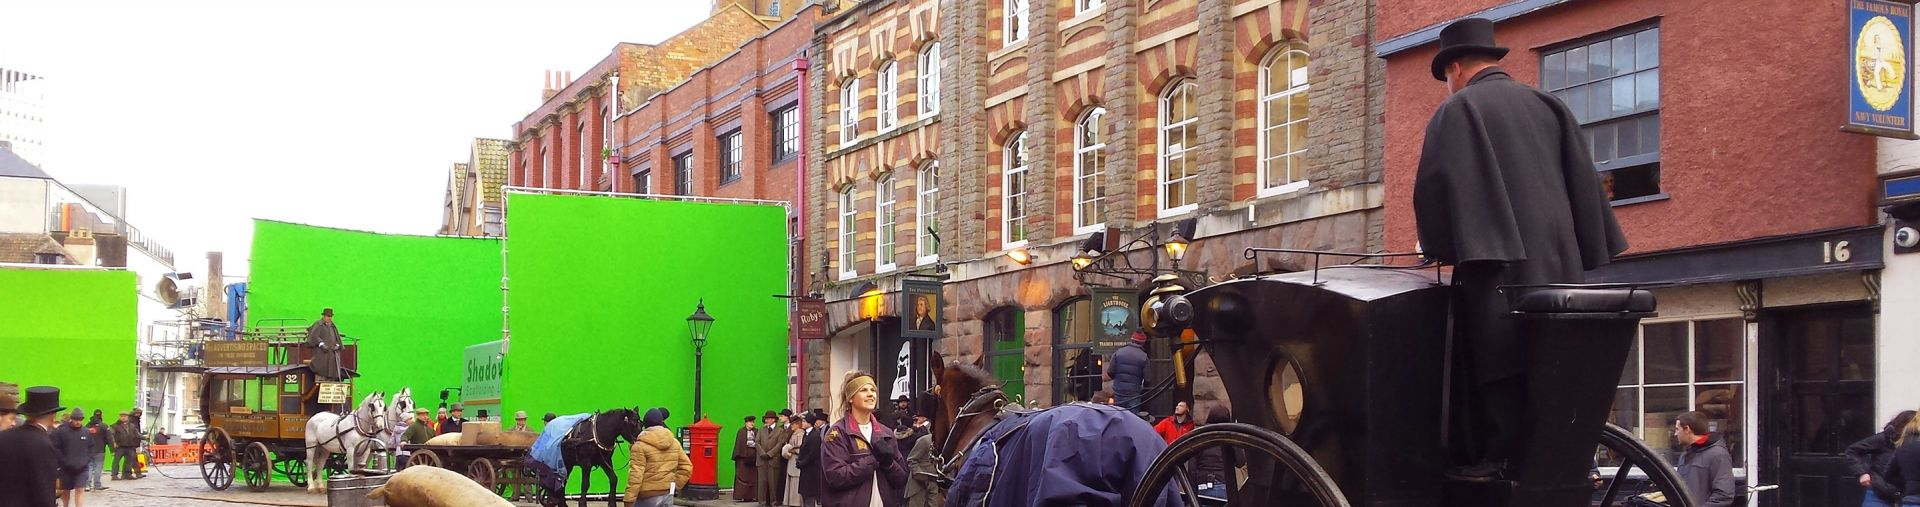 Sherlock filming